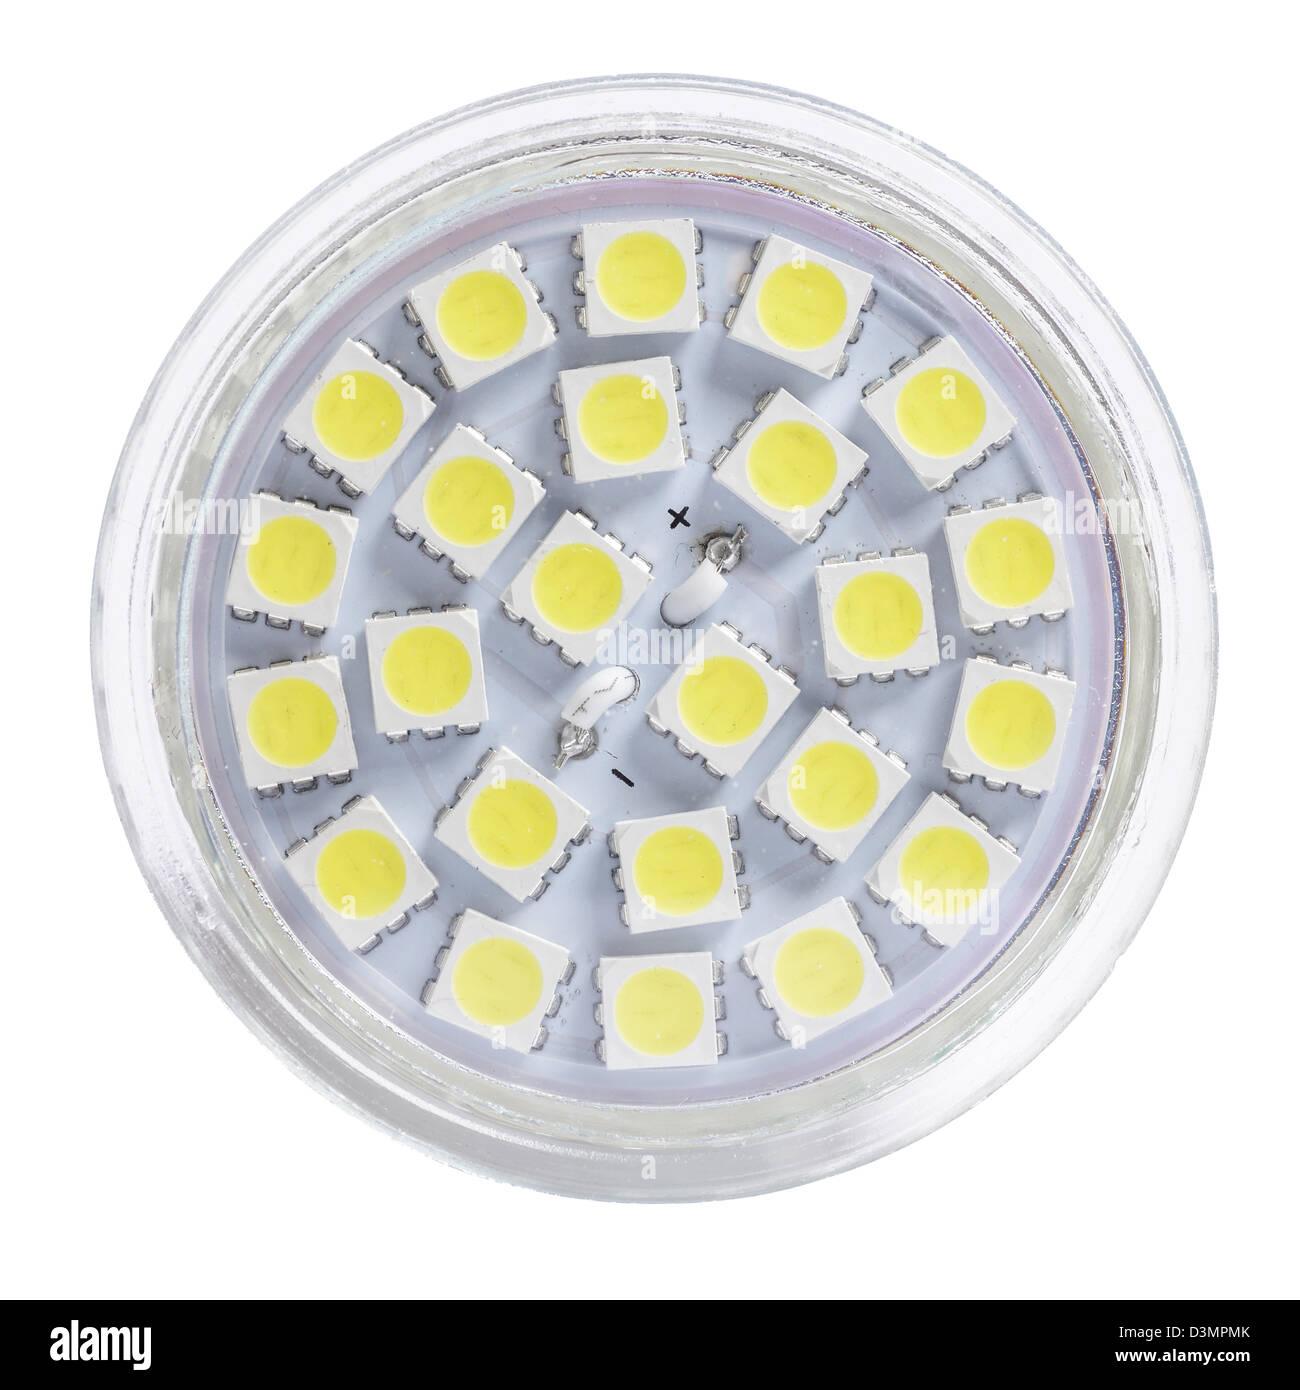 Low energy LED spotlight bulb - Stock Image